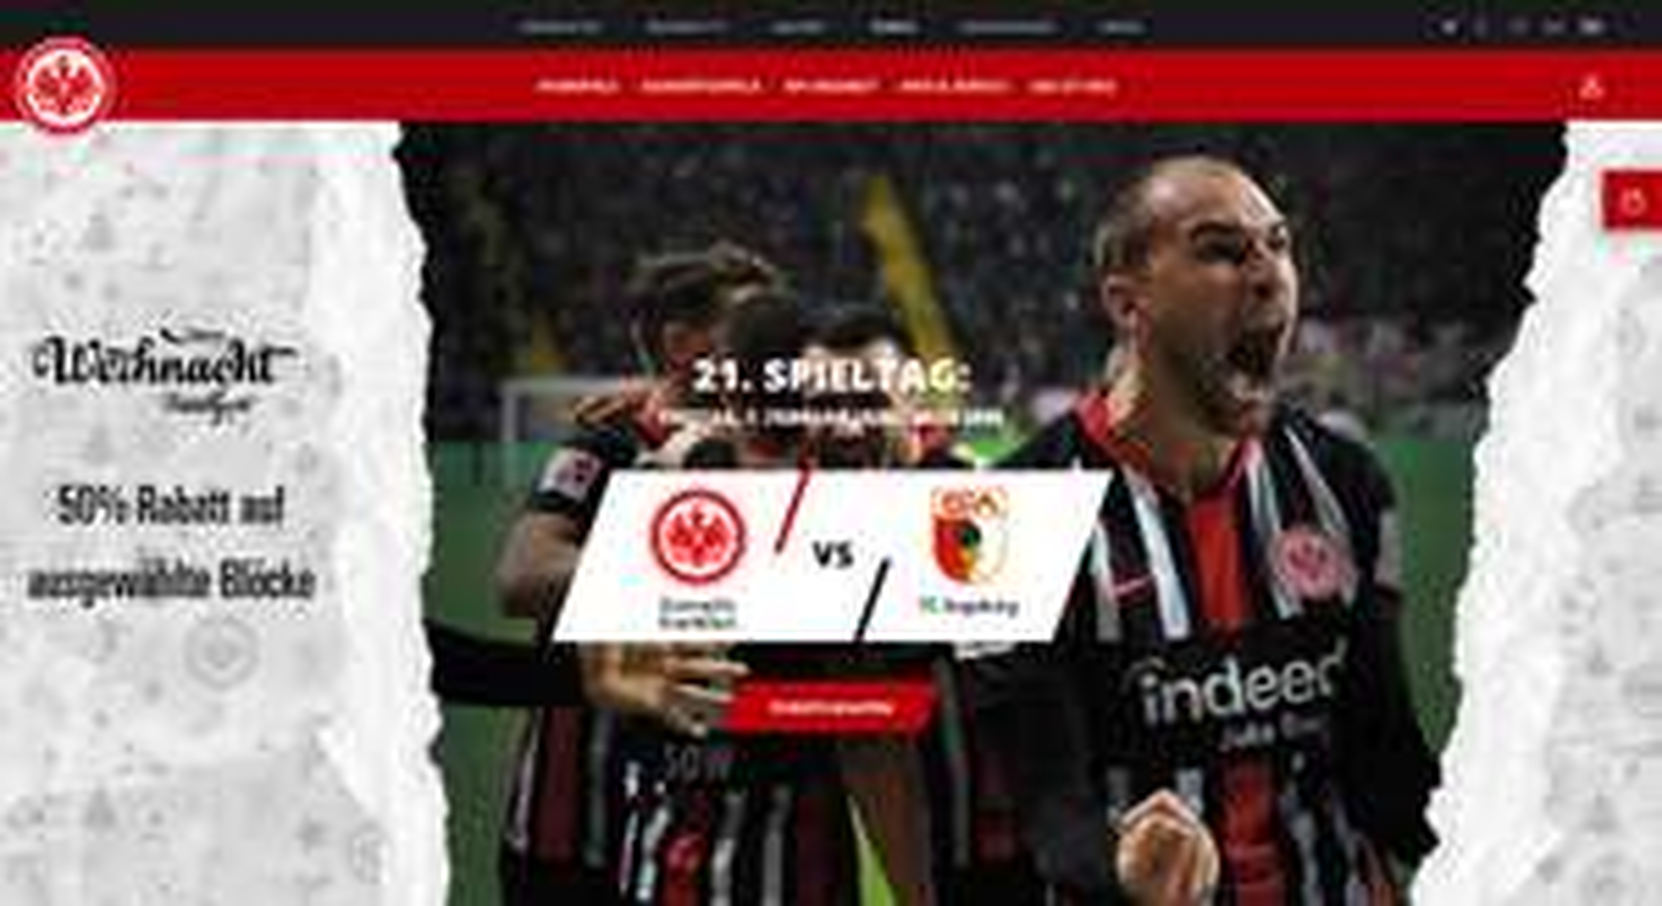 SGE Eintracht Frankfurt vs. FC Augsburg - Bundesliga Fr. 07.02.2020 - Ticket